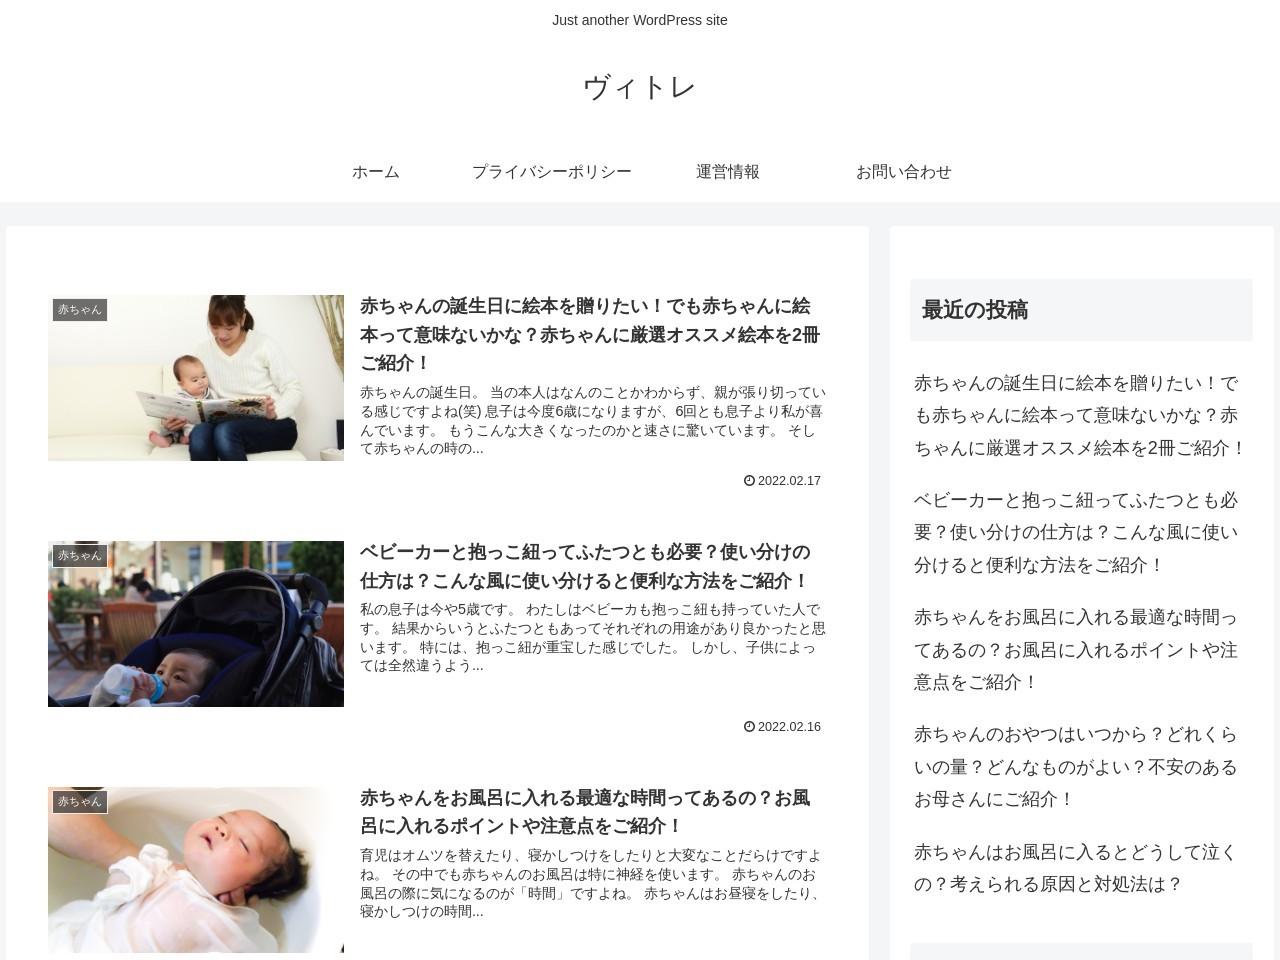 vitre.jp -&nbspヴィトレ 珈琲 焙煎 ギャラリー 自家 工房 カフェ こだわり リソースおよび情報